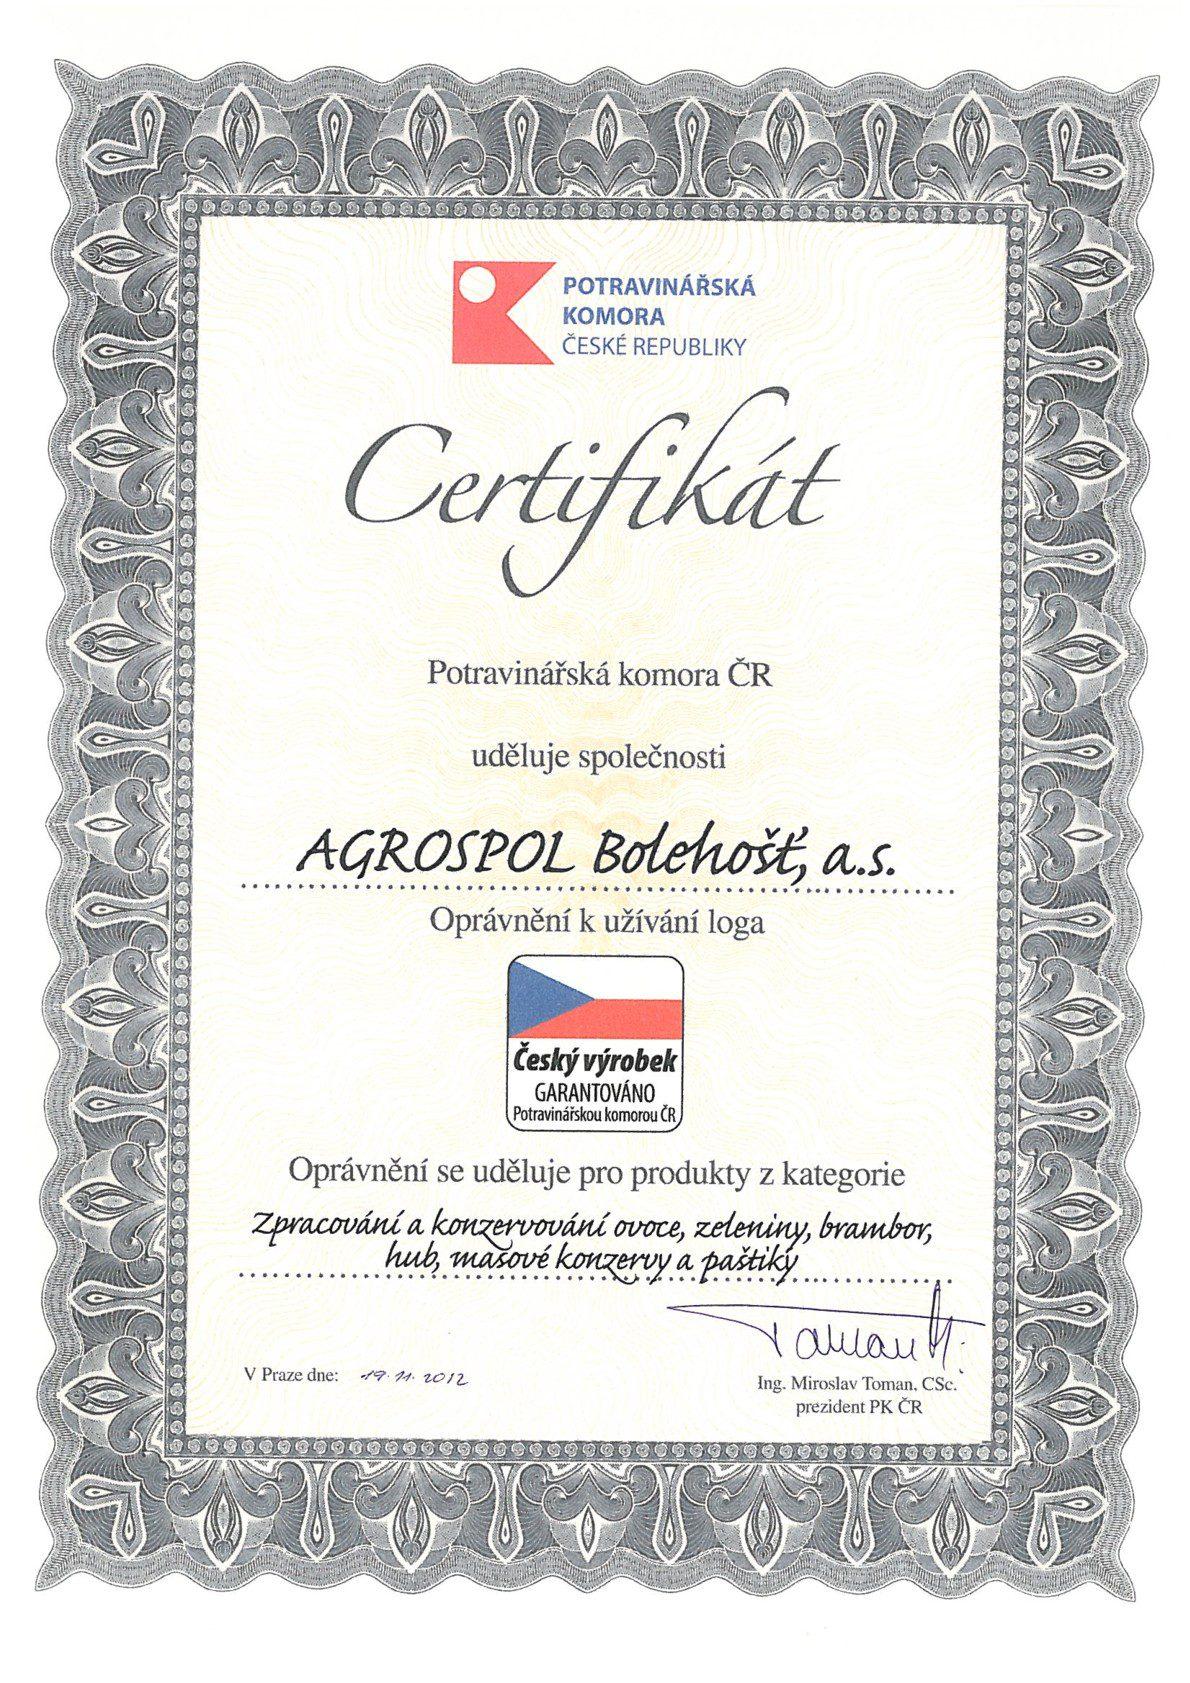 AGROSPOL Bolehošť, a. s. - Certifikát 03